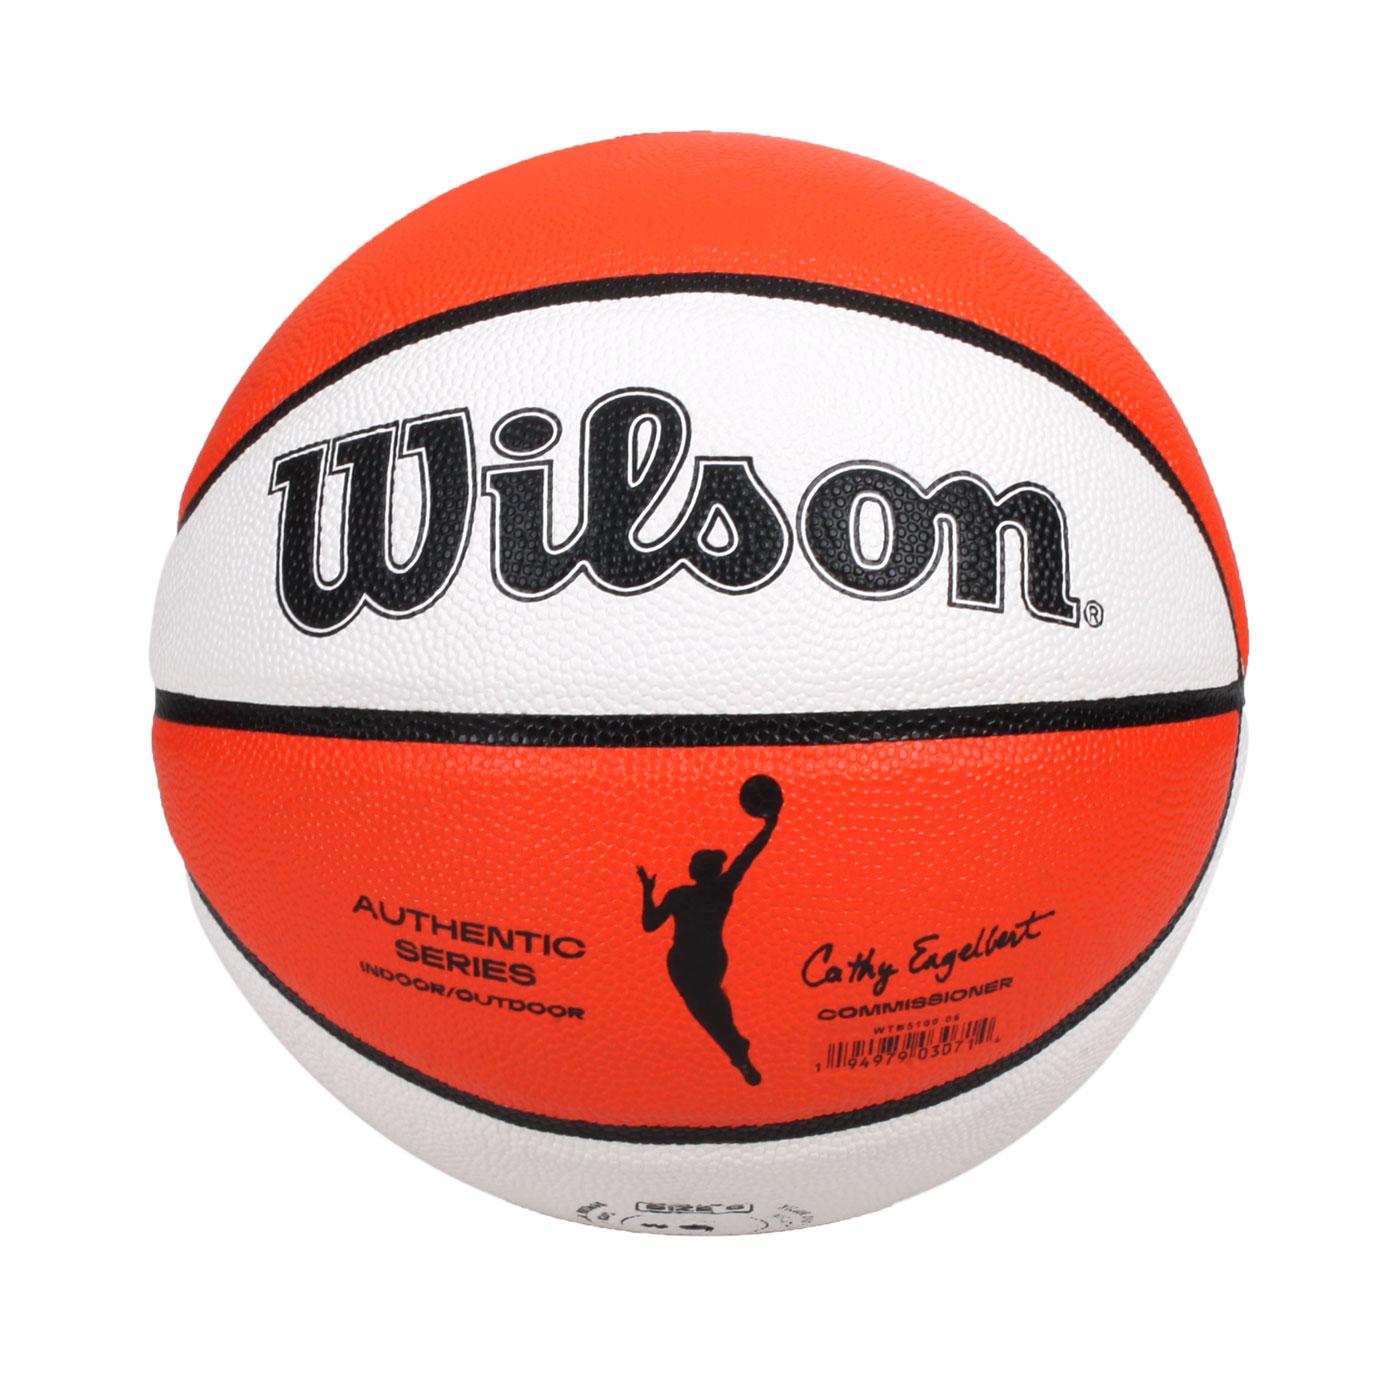 WILSON WNBA AUTH系列室外合成皮籃球#6 WTB5100XB06 - 橘白黑